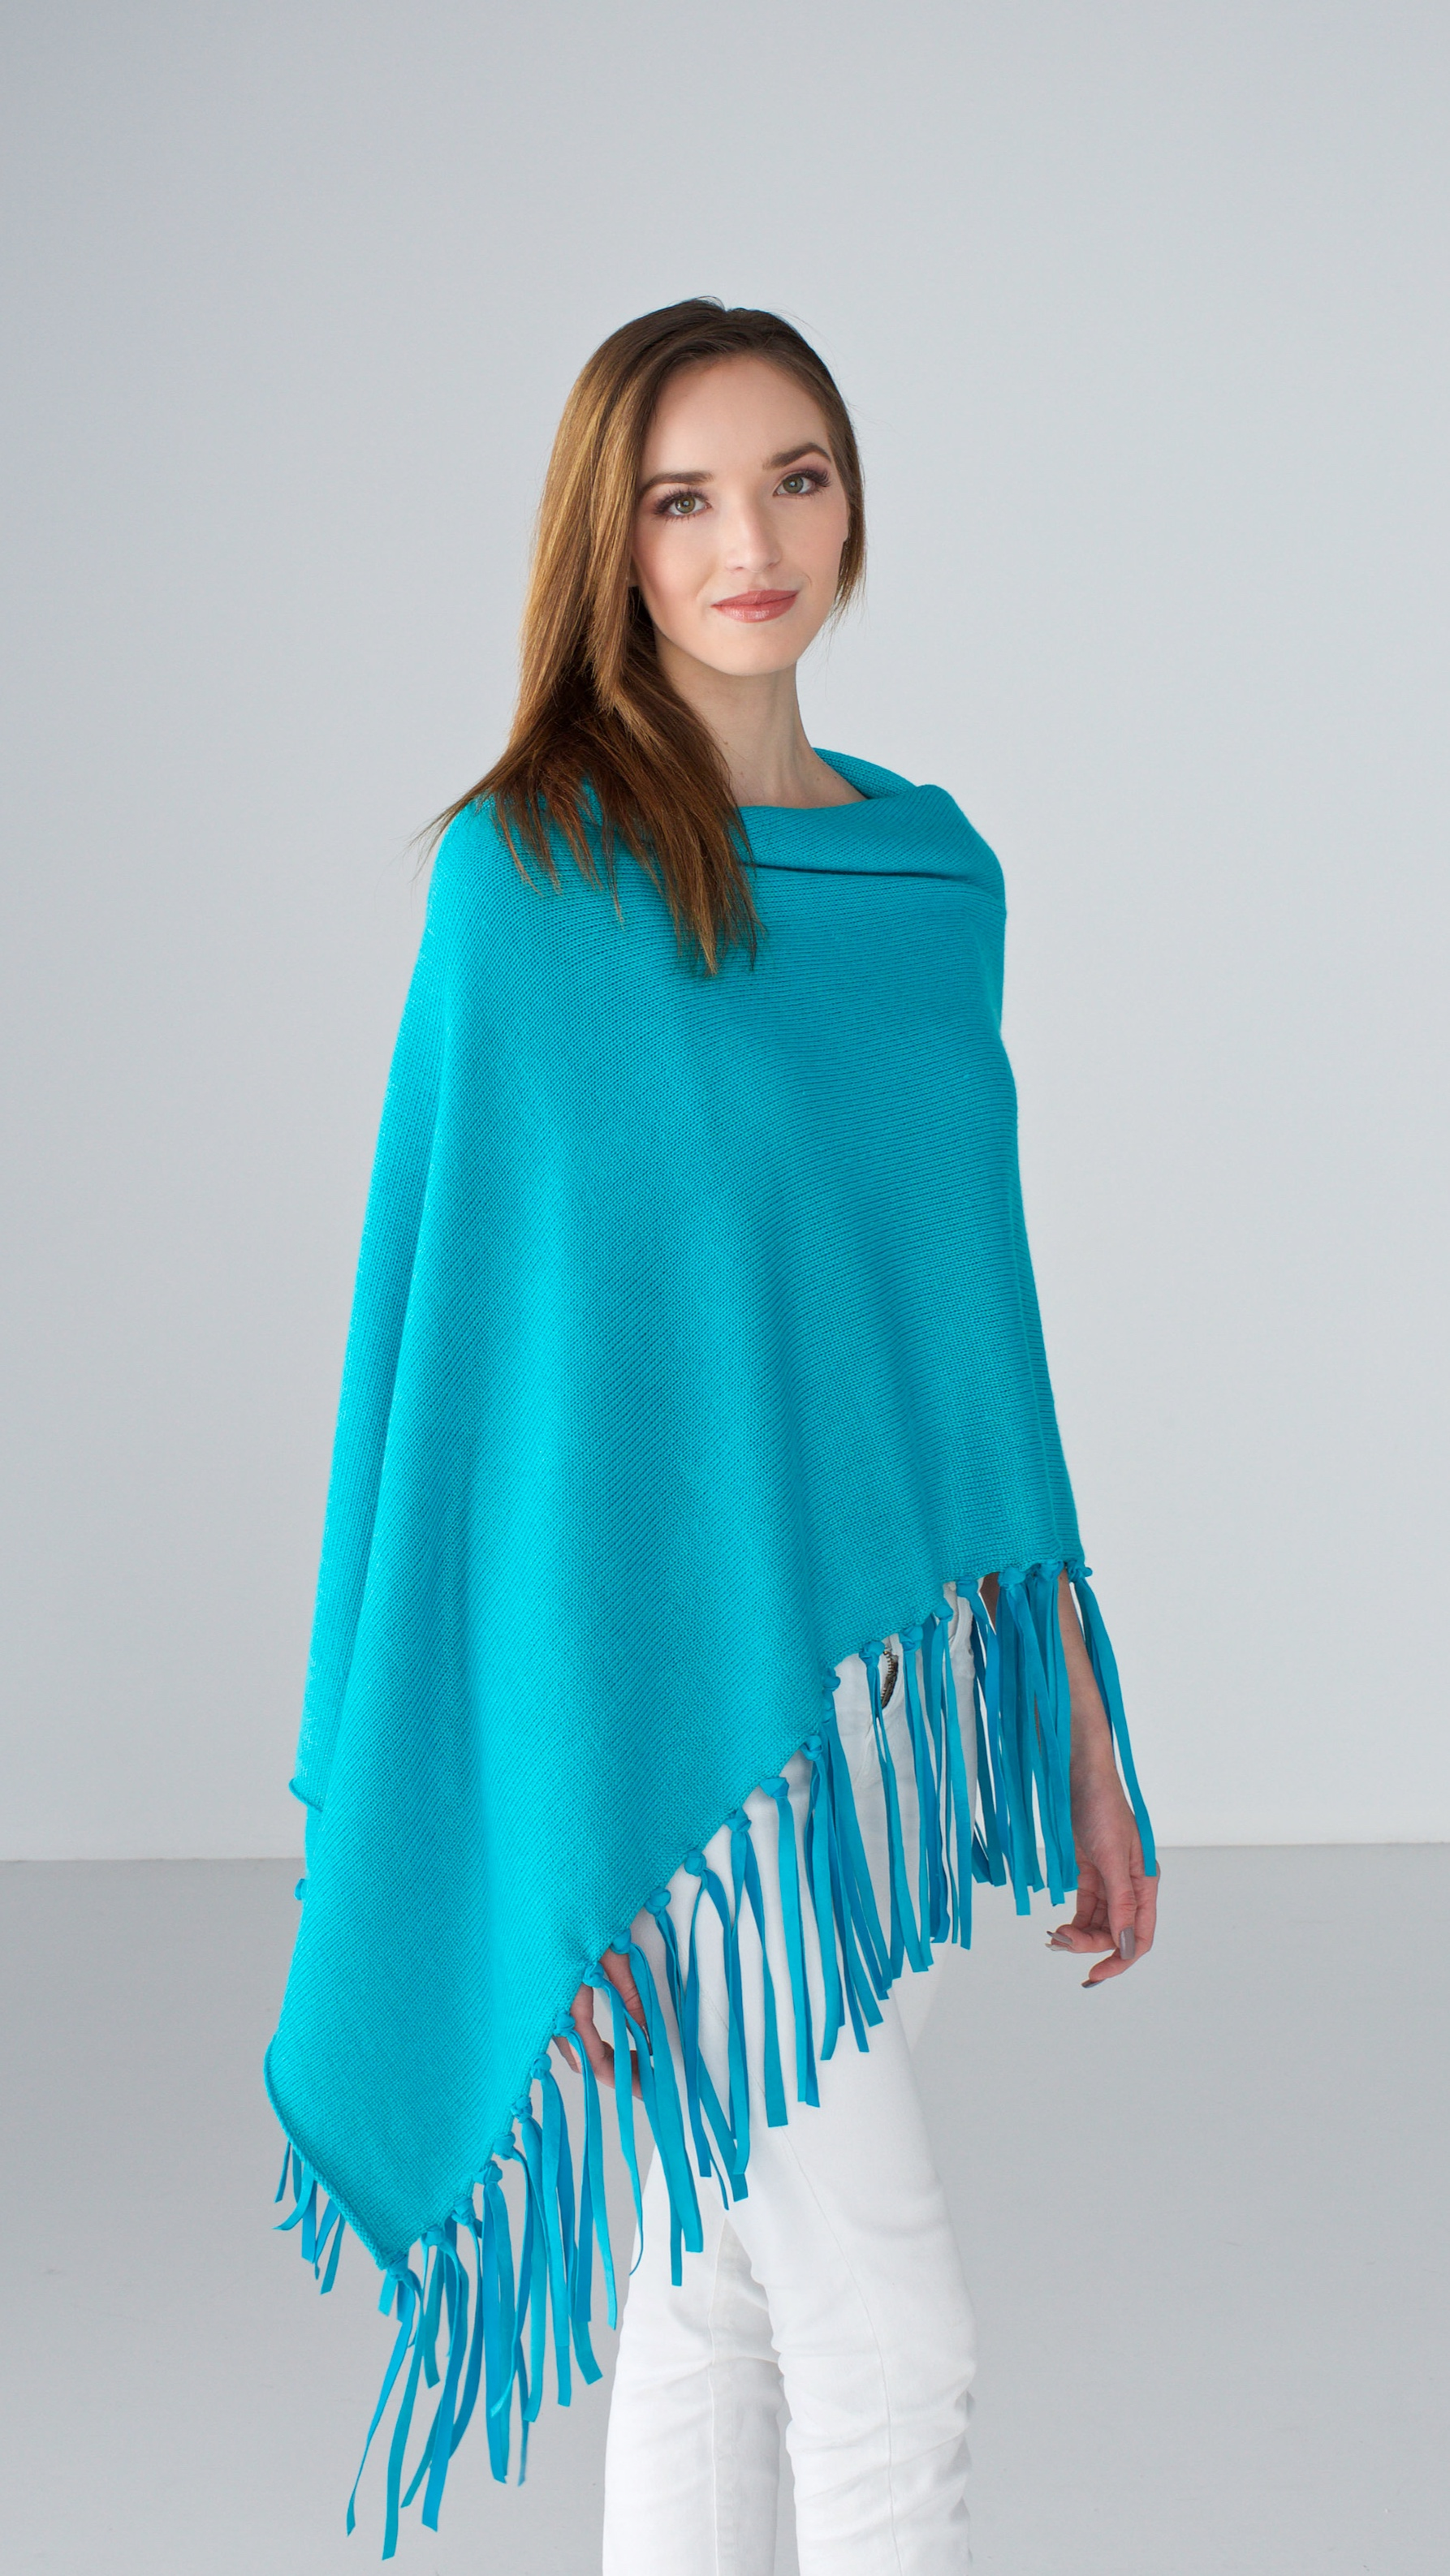 turquoise wrap leather C01B5981 -2.jpg